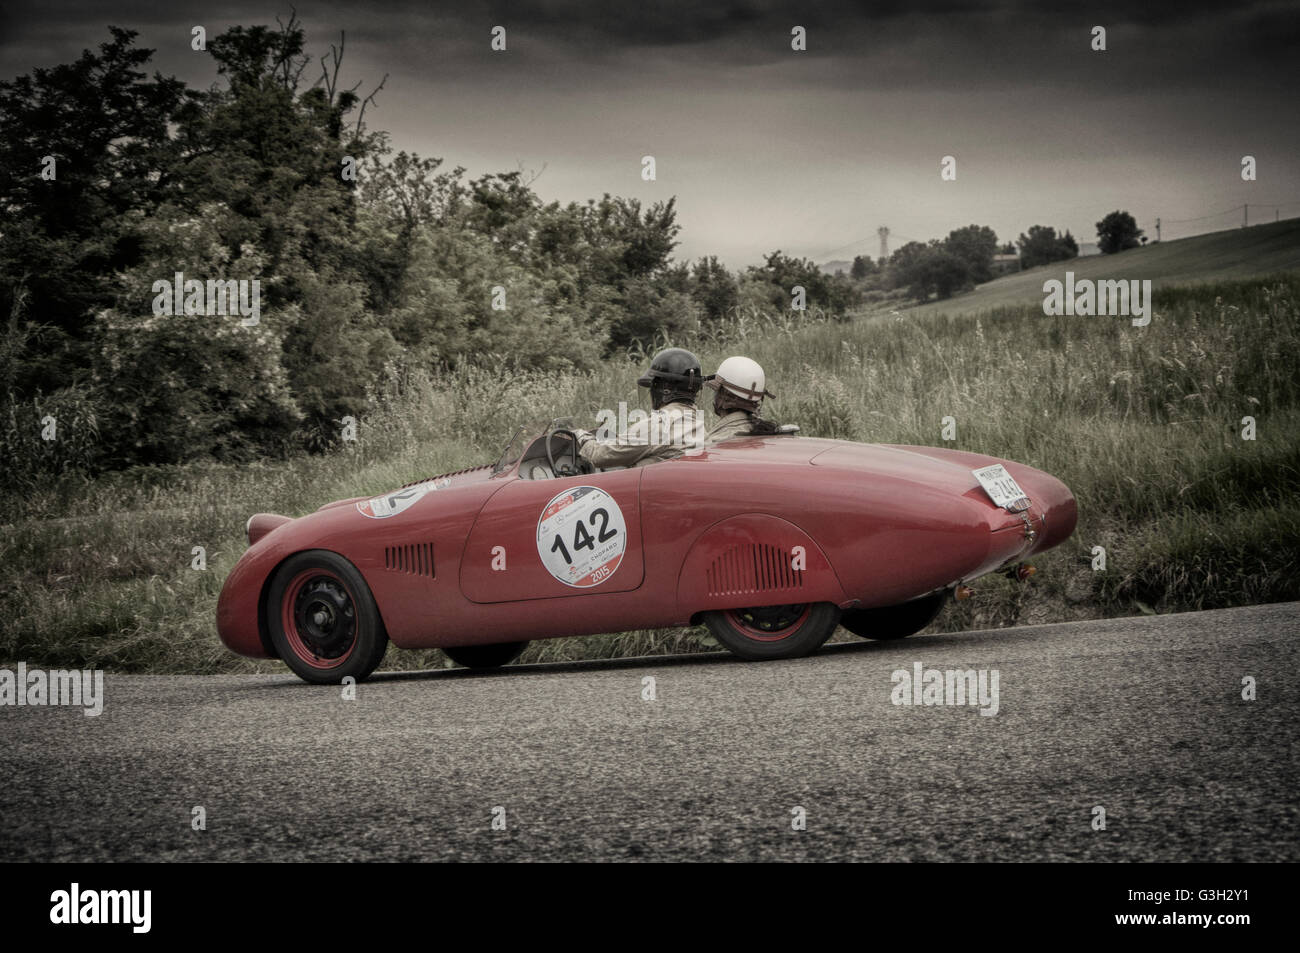 S.I.A.T.A. Pescara 1939 - Stock Image